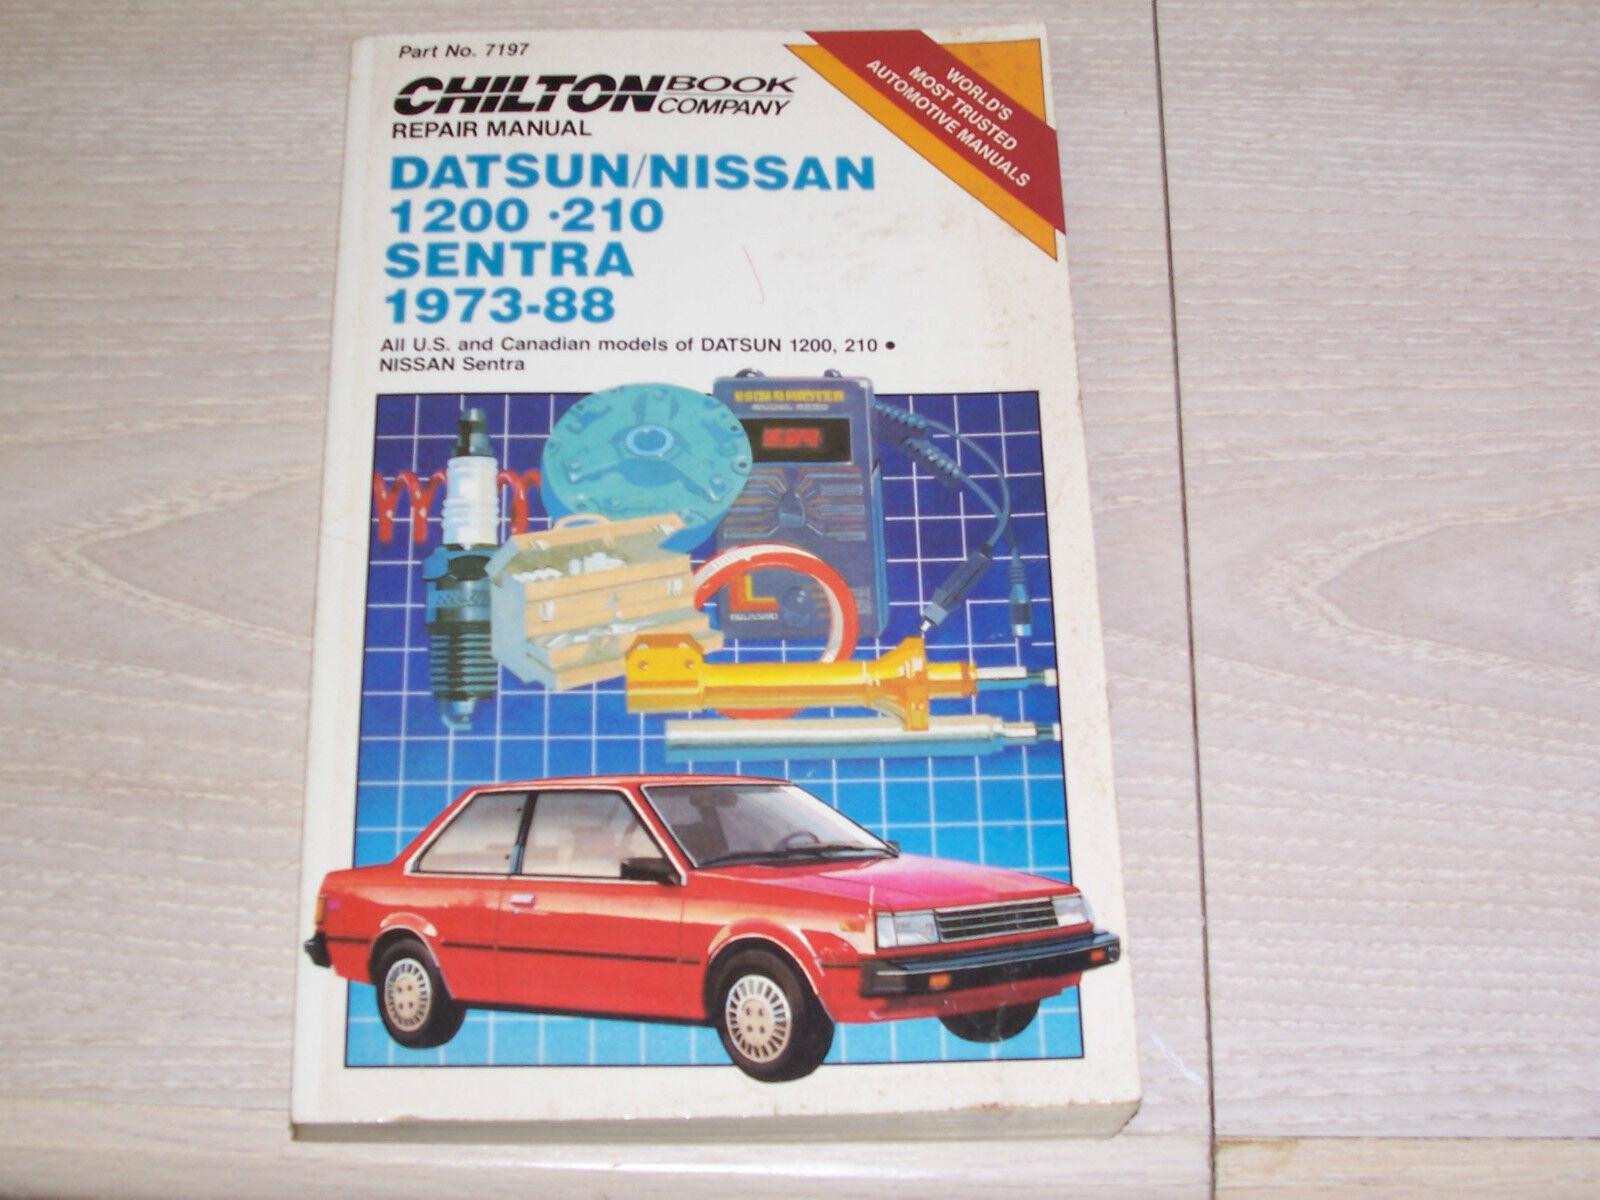 Nissan Sentra Service Manual: Suspension